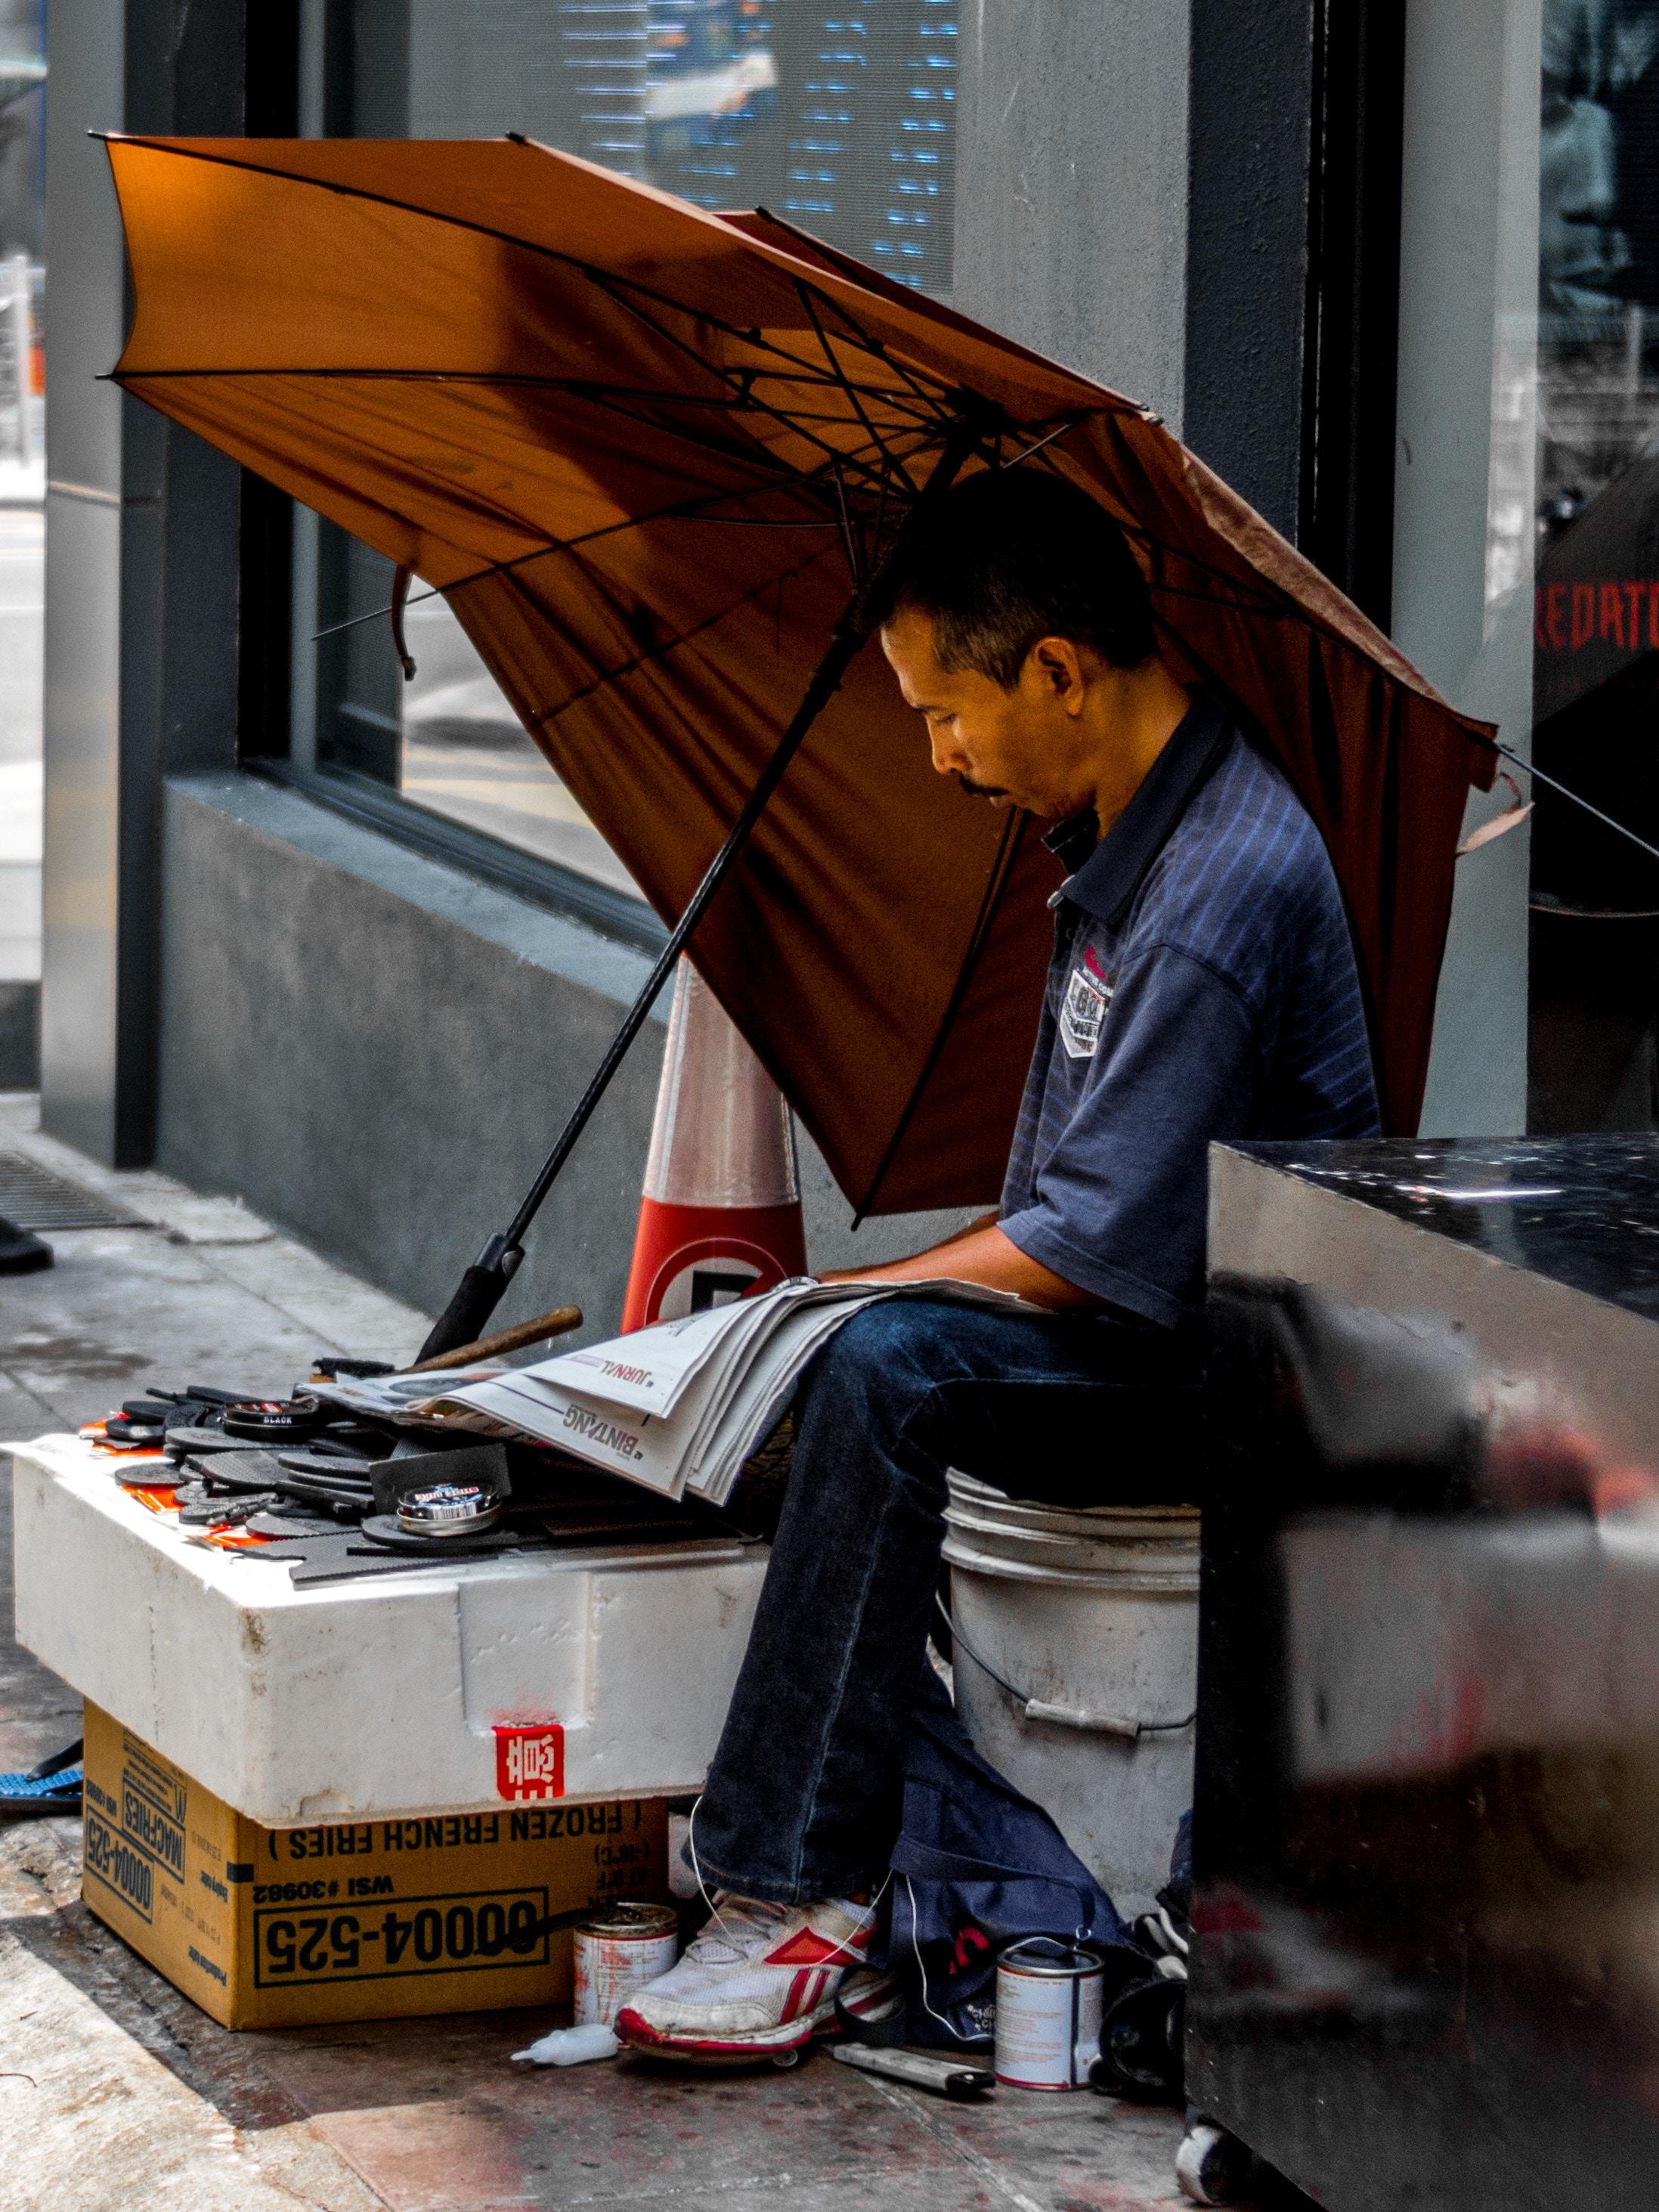 A street vendor reads the newspaper in Kuala Lumpur, Malaysia.